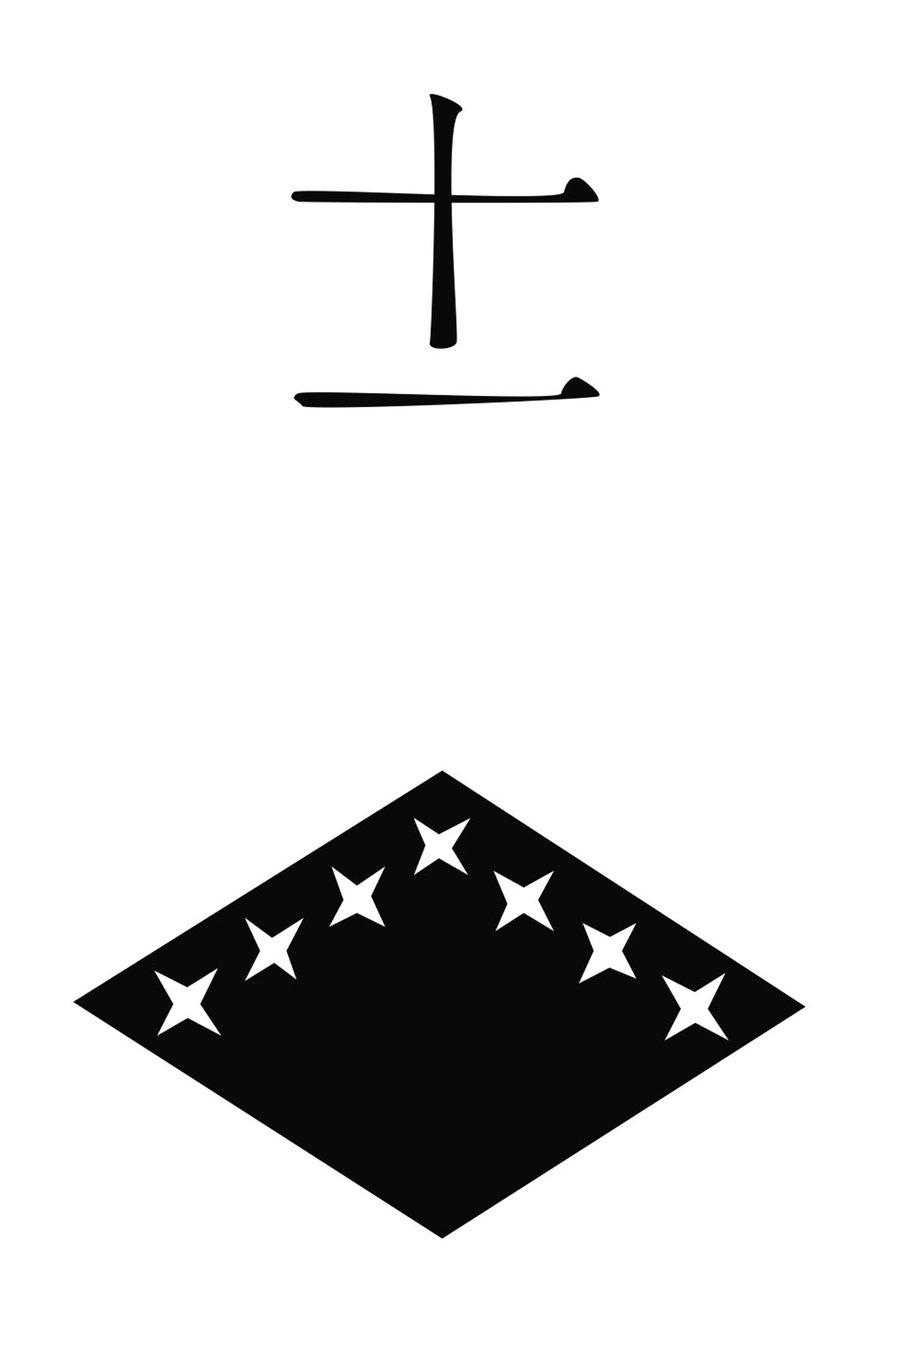 11th_Division_Insignia.jpg